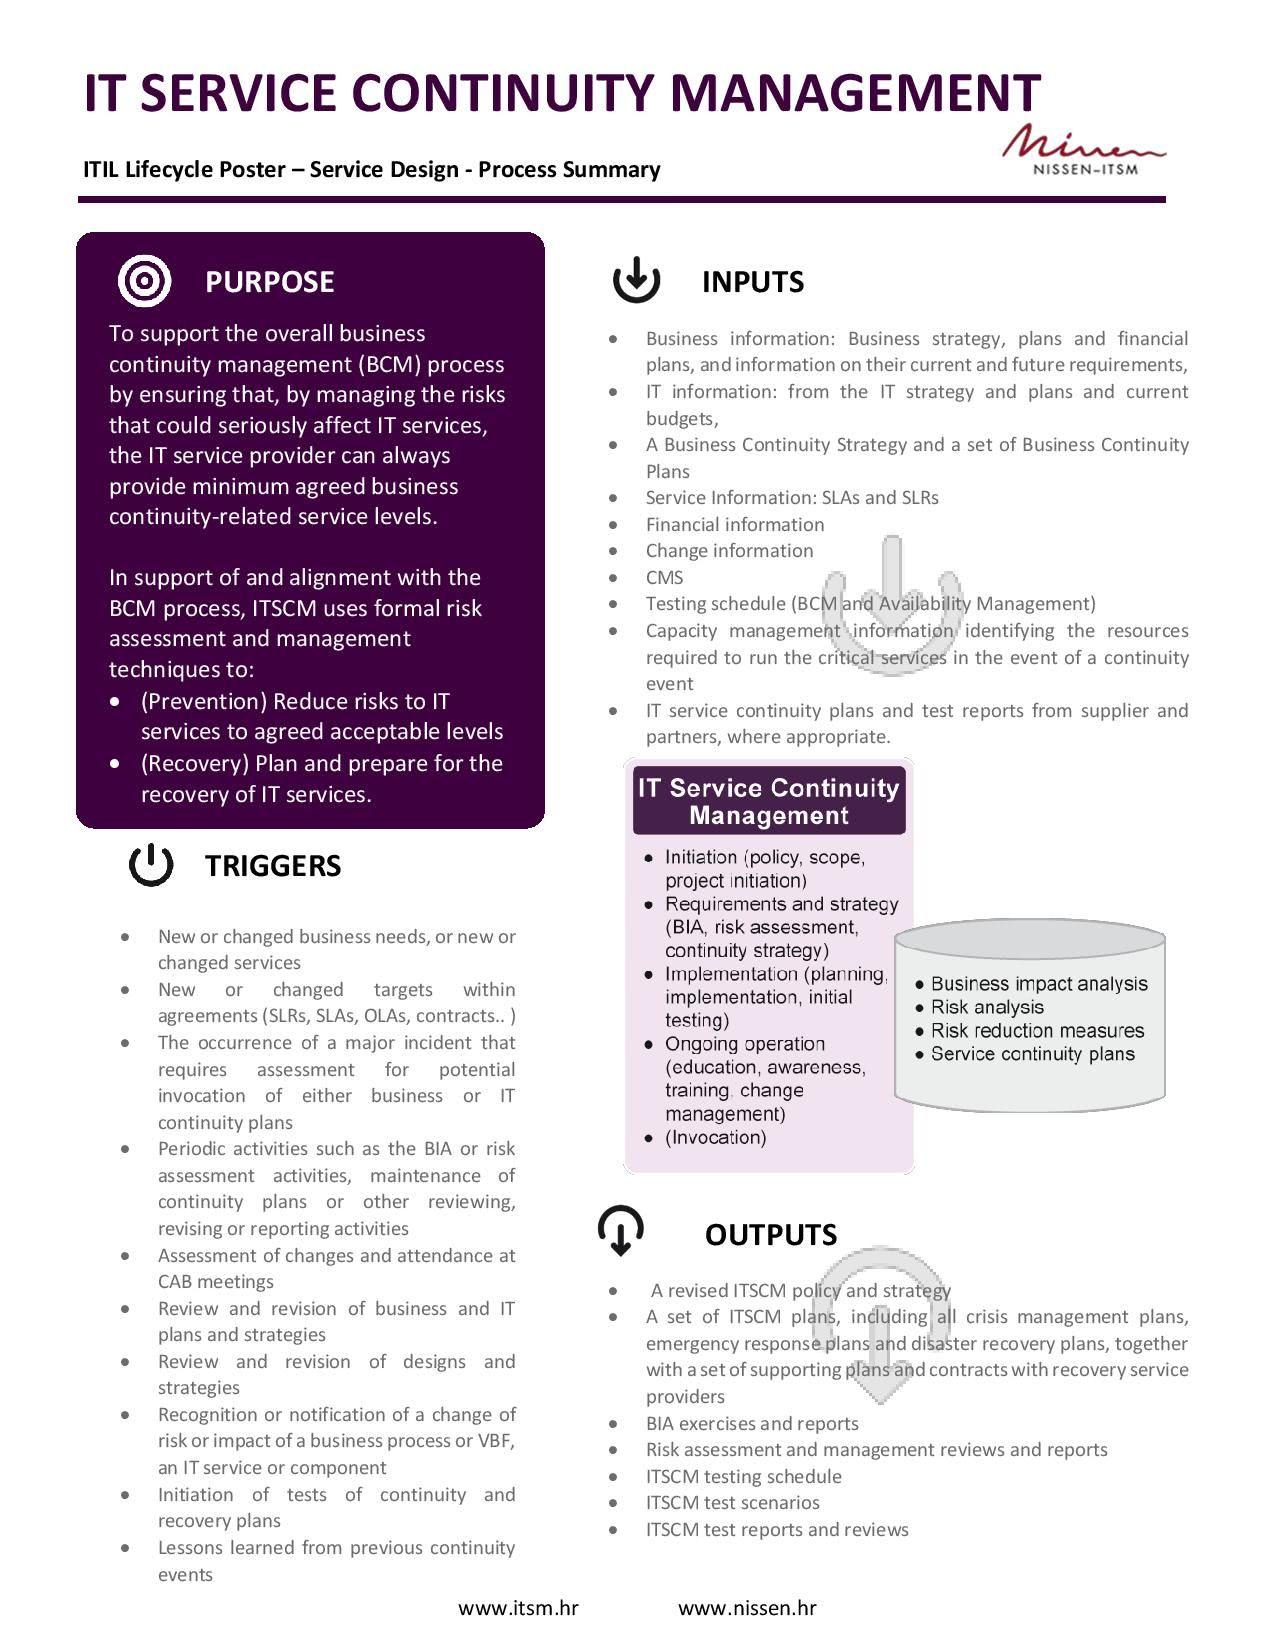 Arhiva itil poster nissen itsm its partner policy